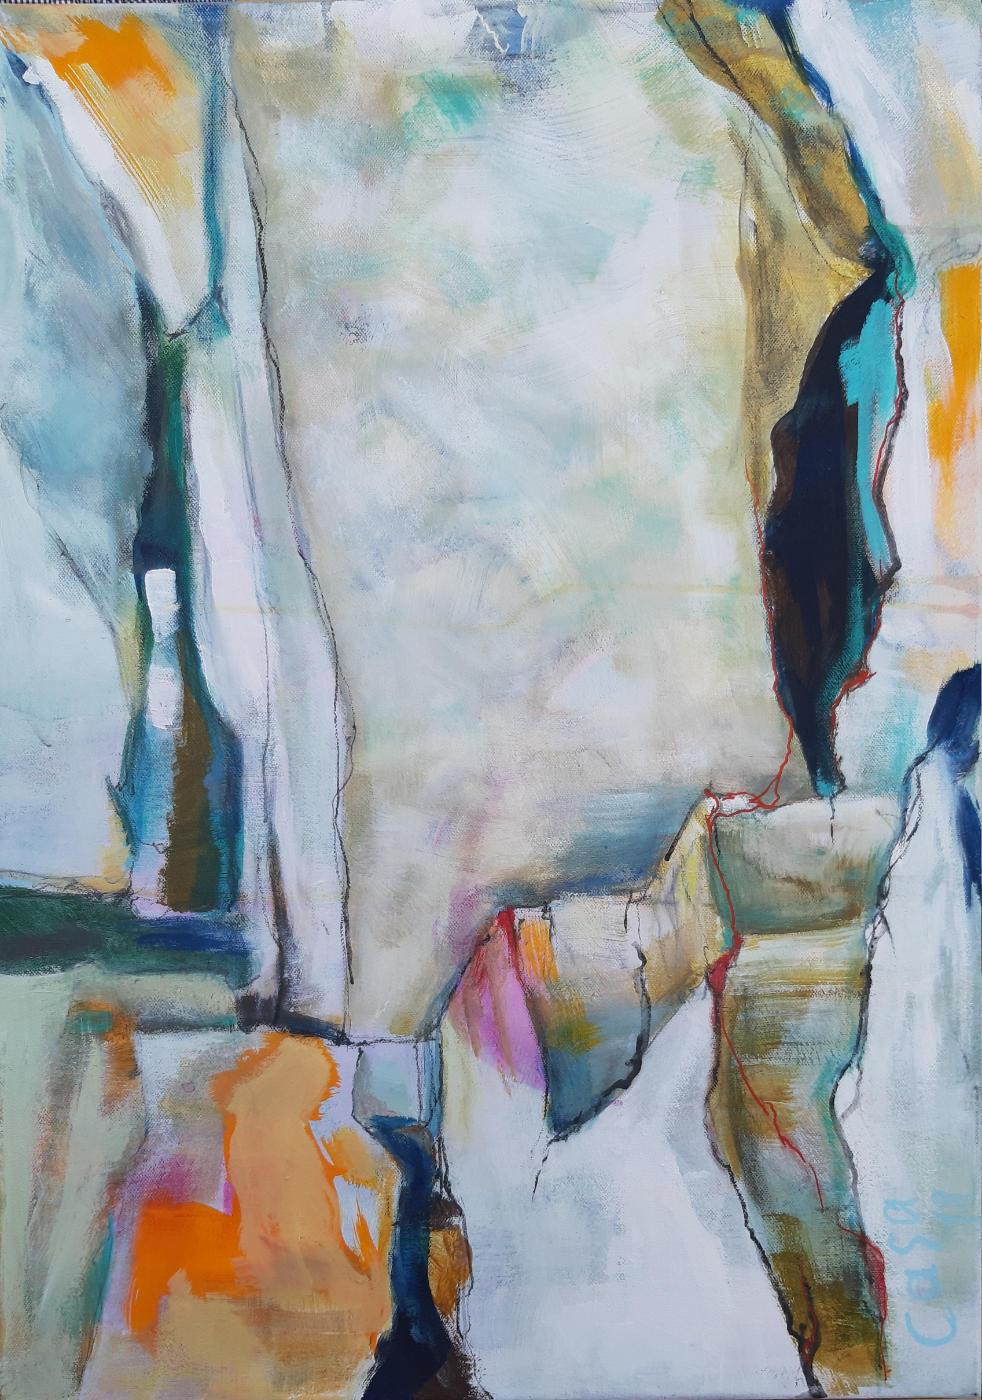 Alb IV - Acryl auf Leinwand, 70 x 50 cm